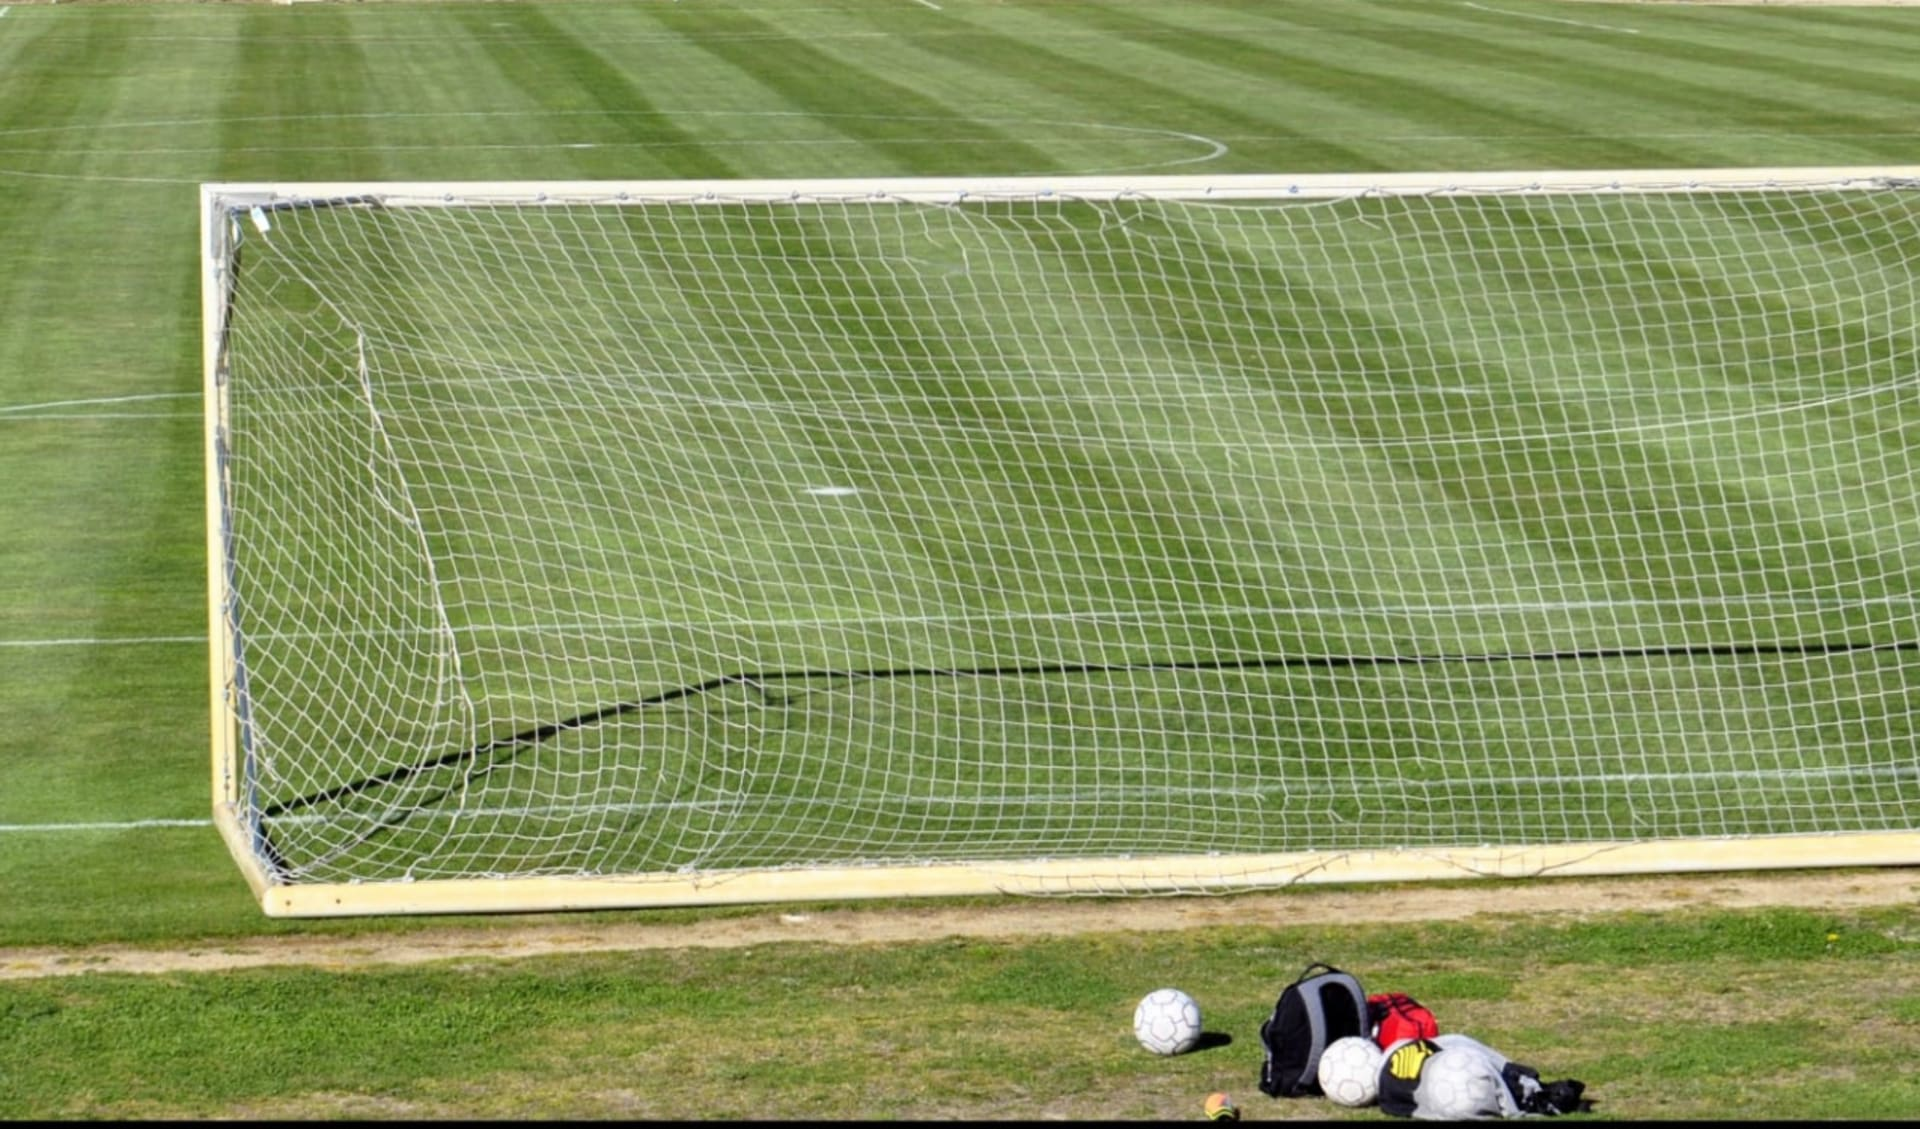 Lloret de Mar - Hotel Olympic Park ab Costa Brava: Goal